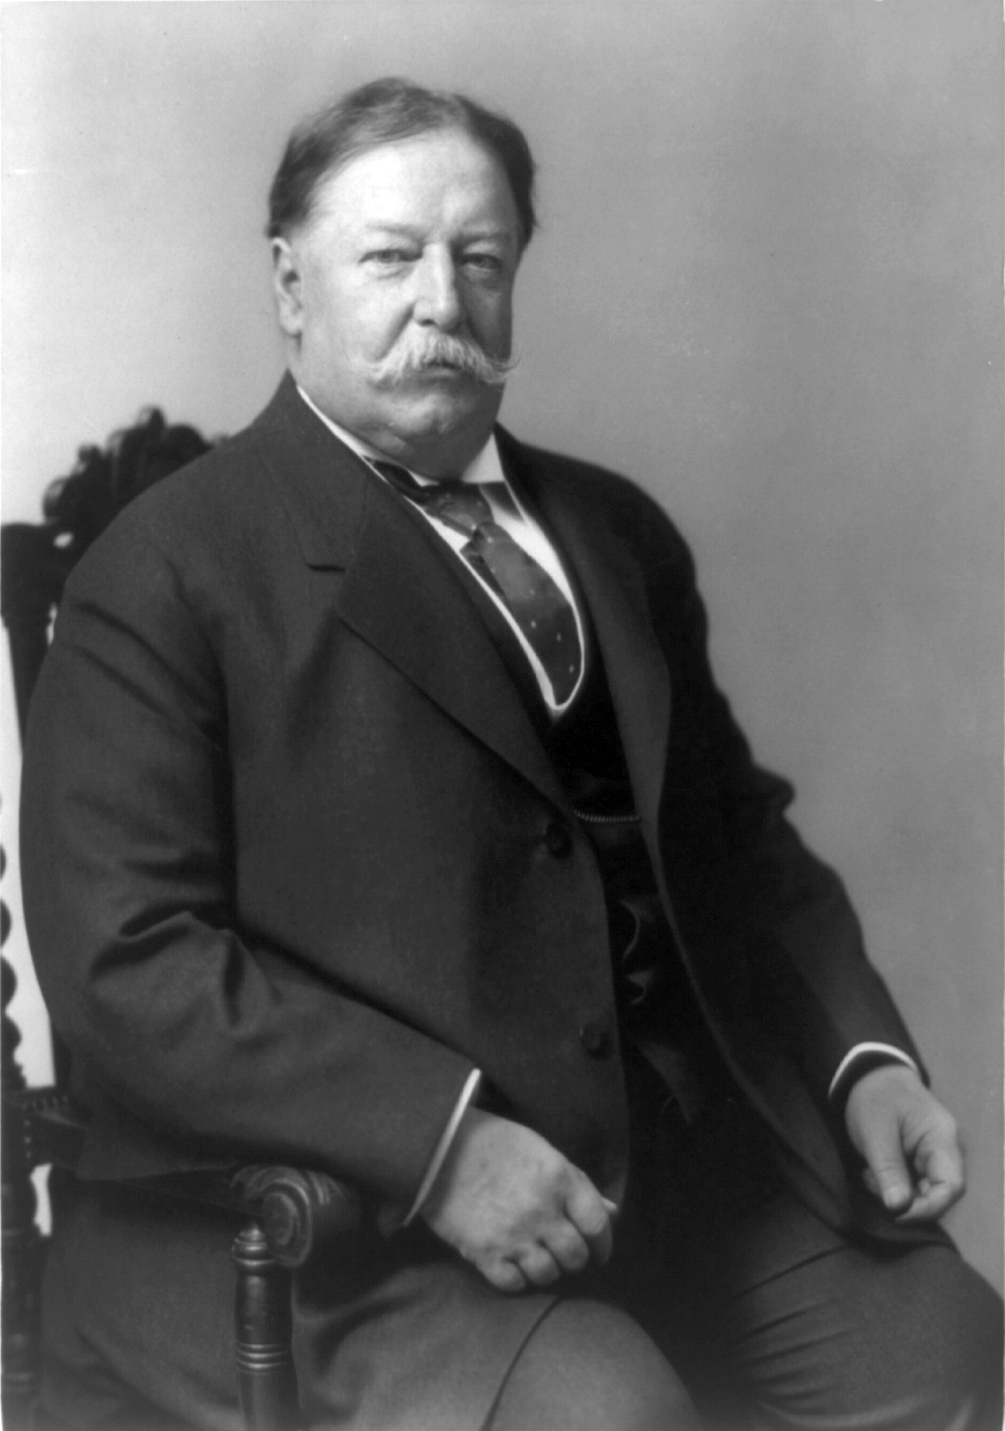 William Howard Taft cph 3b35813 jpg William 20Howard 20Taft    William Taft Full Body